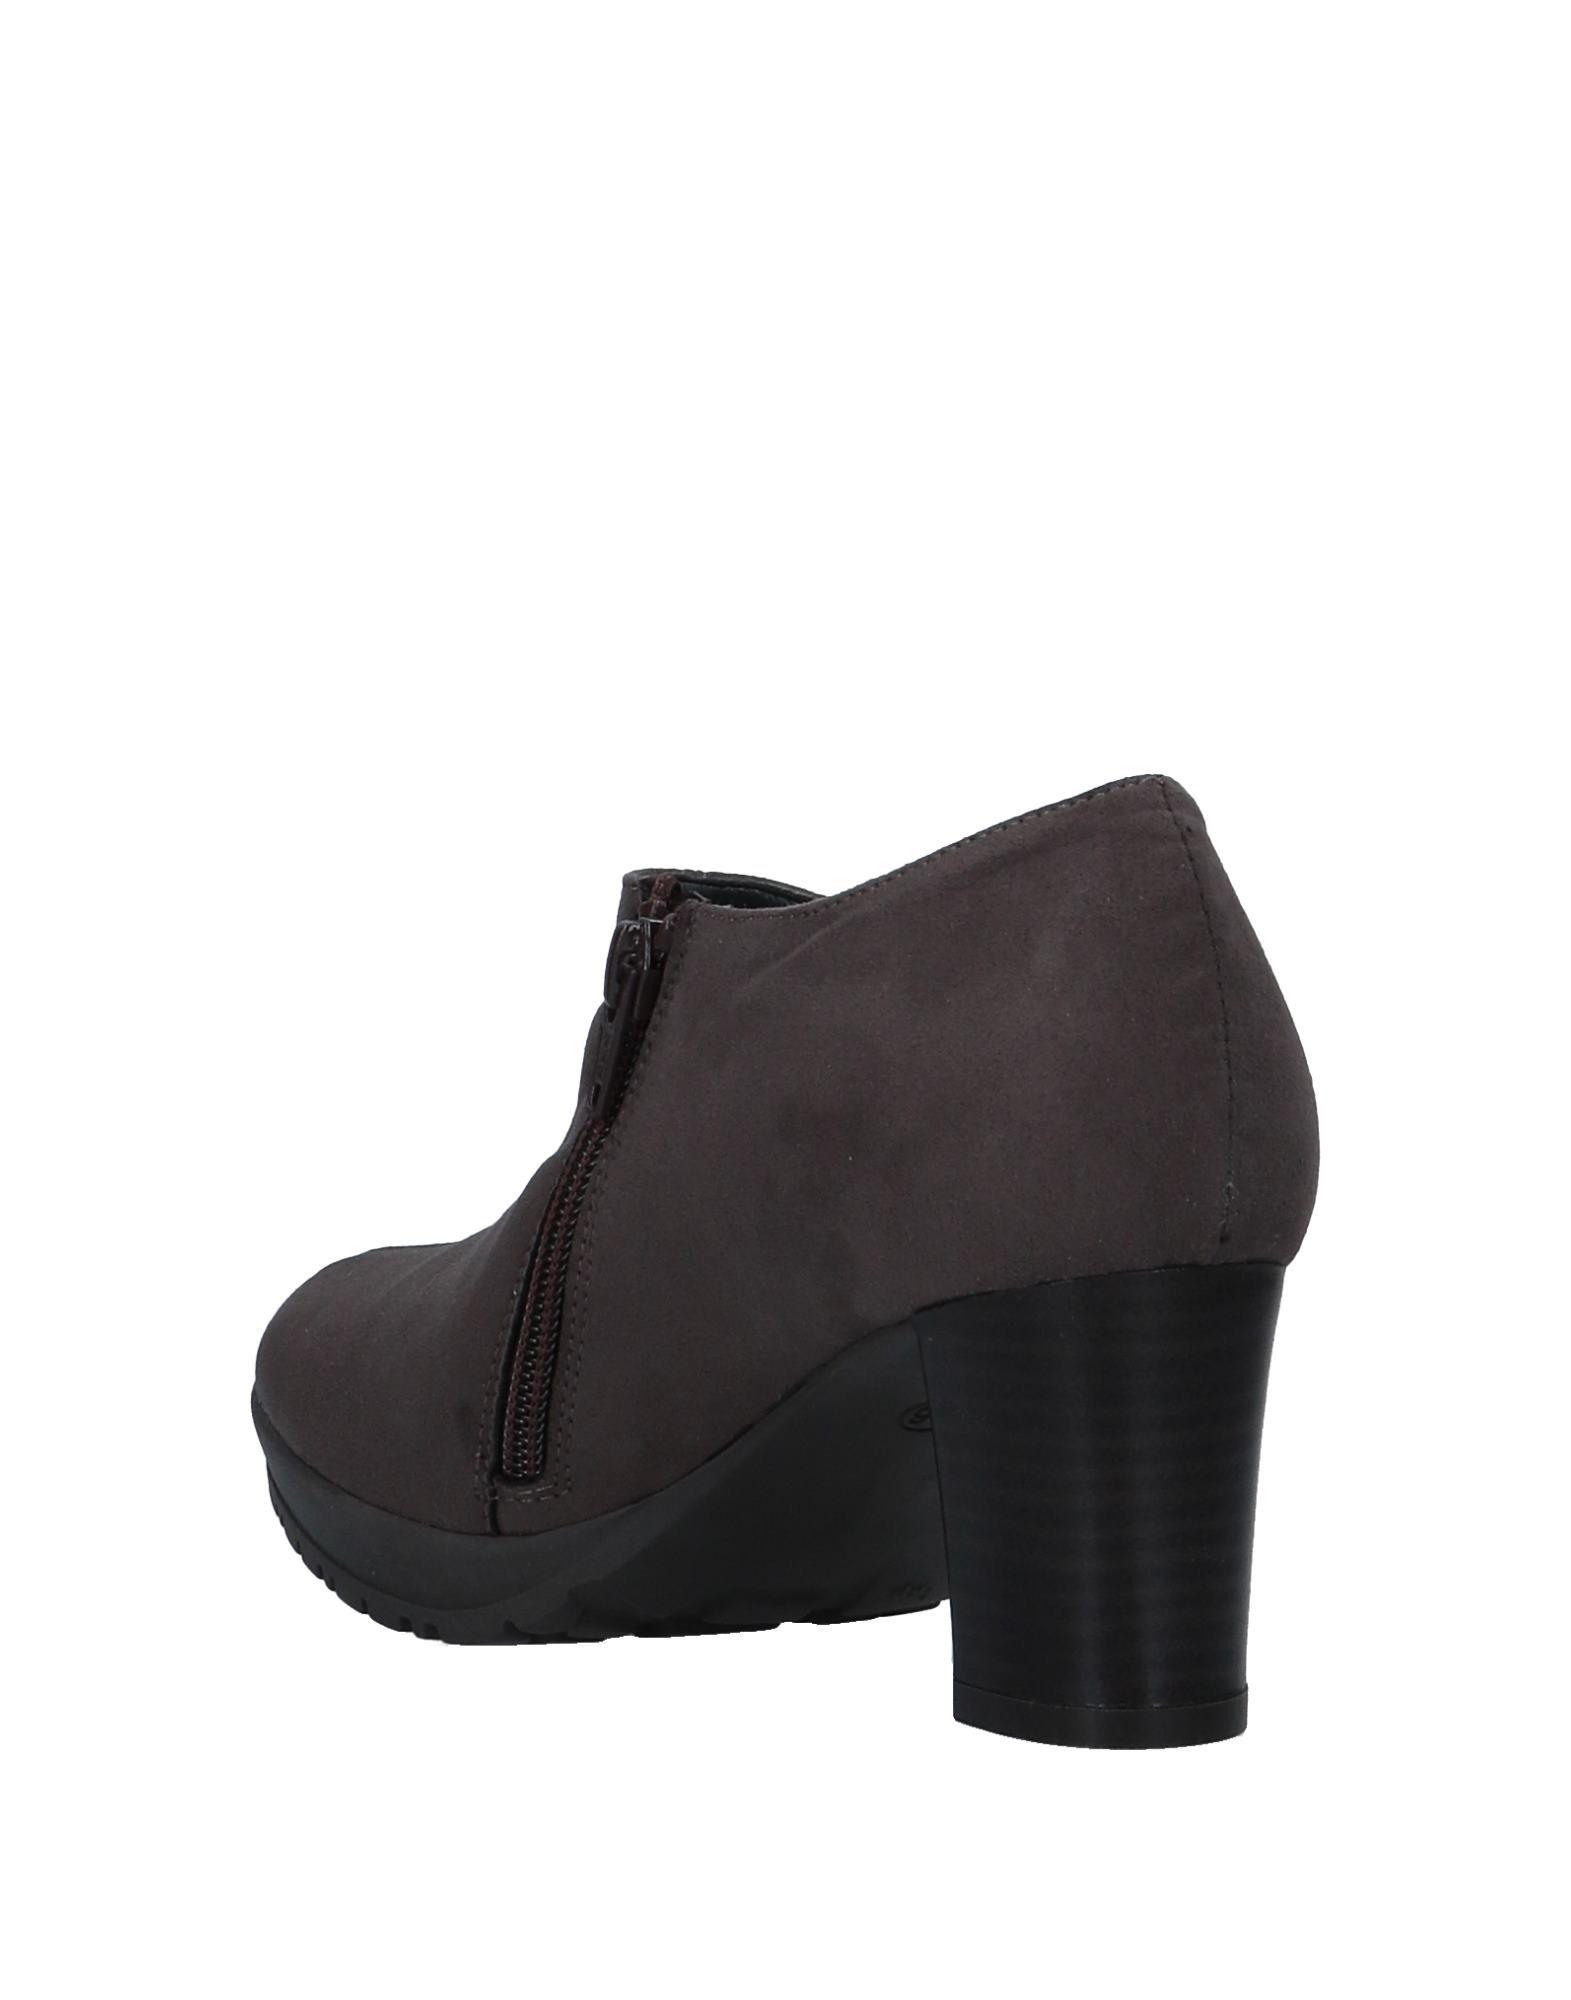 Cinzia Soft By Mauri Moda Stiefelette Damen beliebte  11534788VX Gute Qualität beliebte Damen Schuhe d8fead